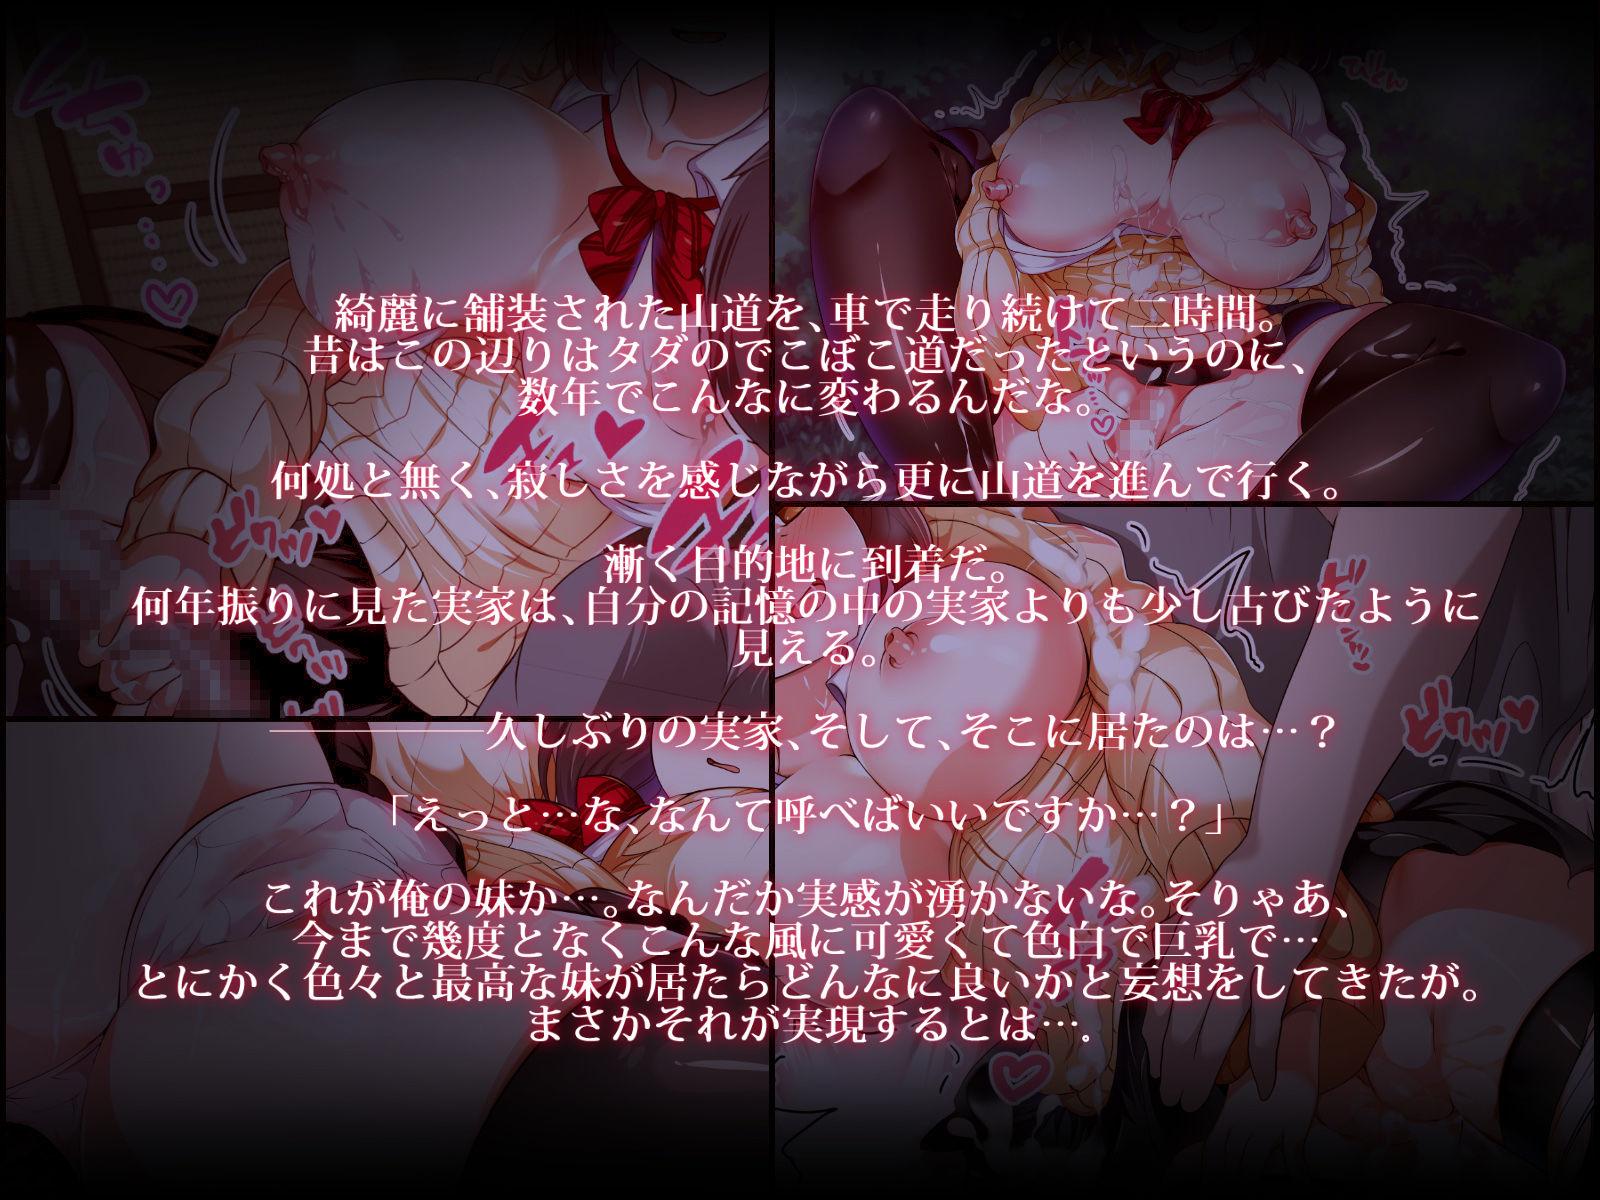 [美少女]「素人写真集「PRIVATE-HIKARI- SIDE.B」」(素人)